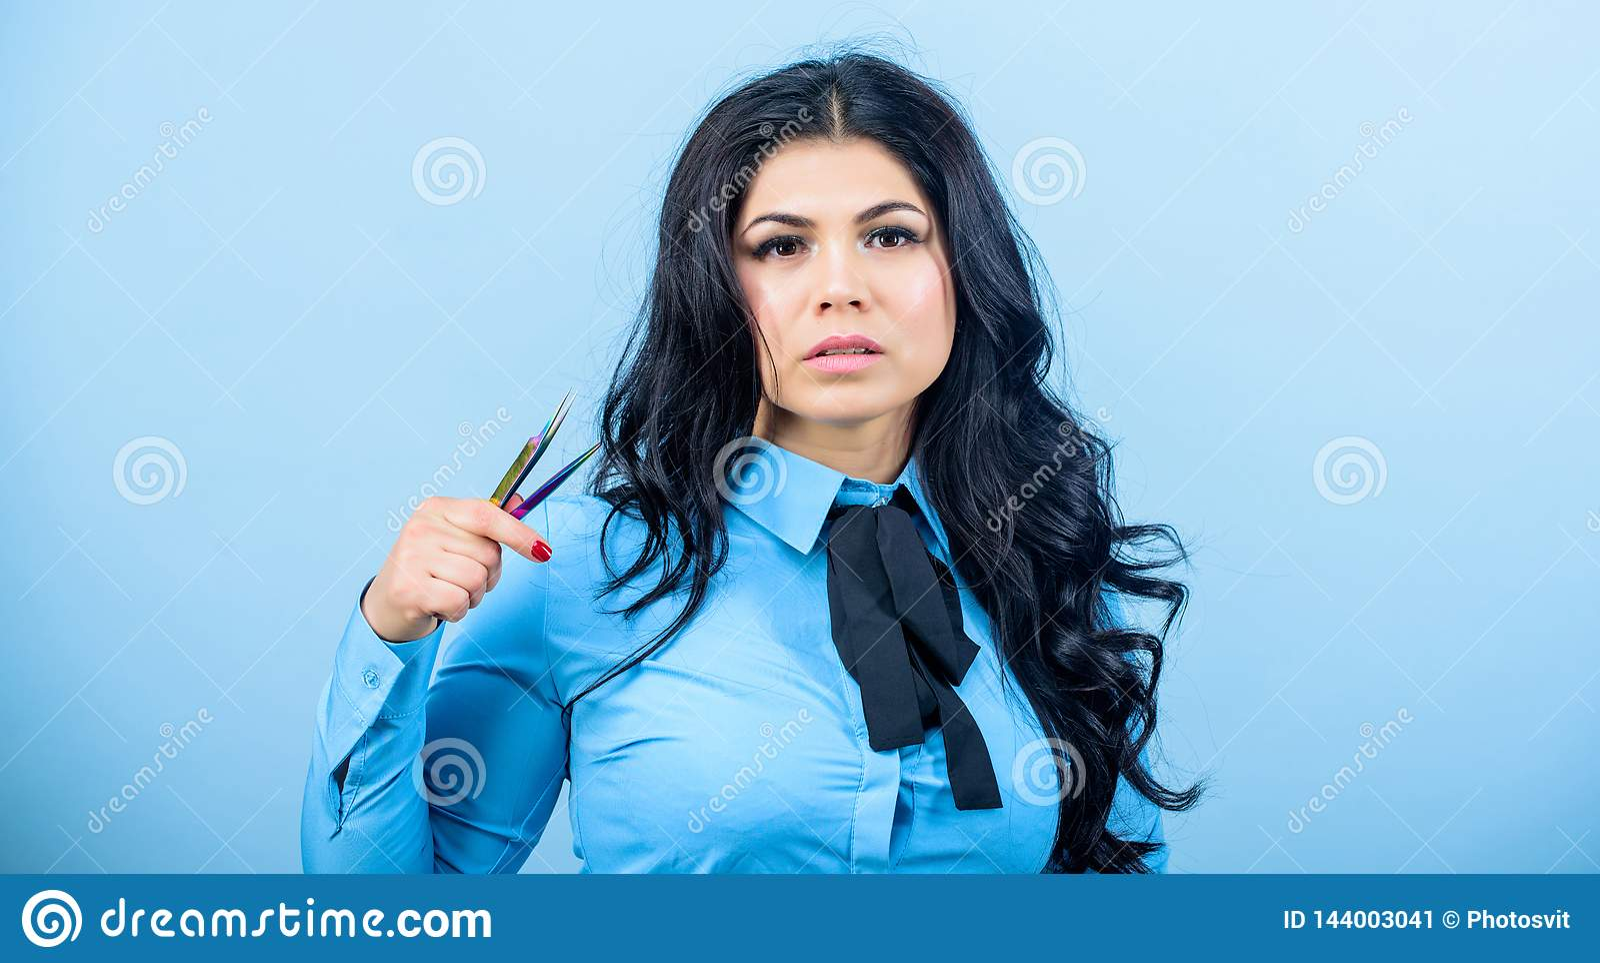 Makeup false lashes volume. Lash applicator. Eyelash extension tweezer. Professional makeup artist. Cosmetic tweezer